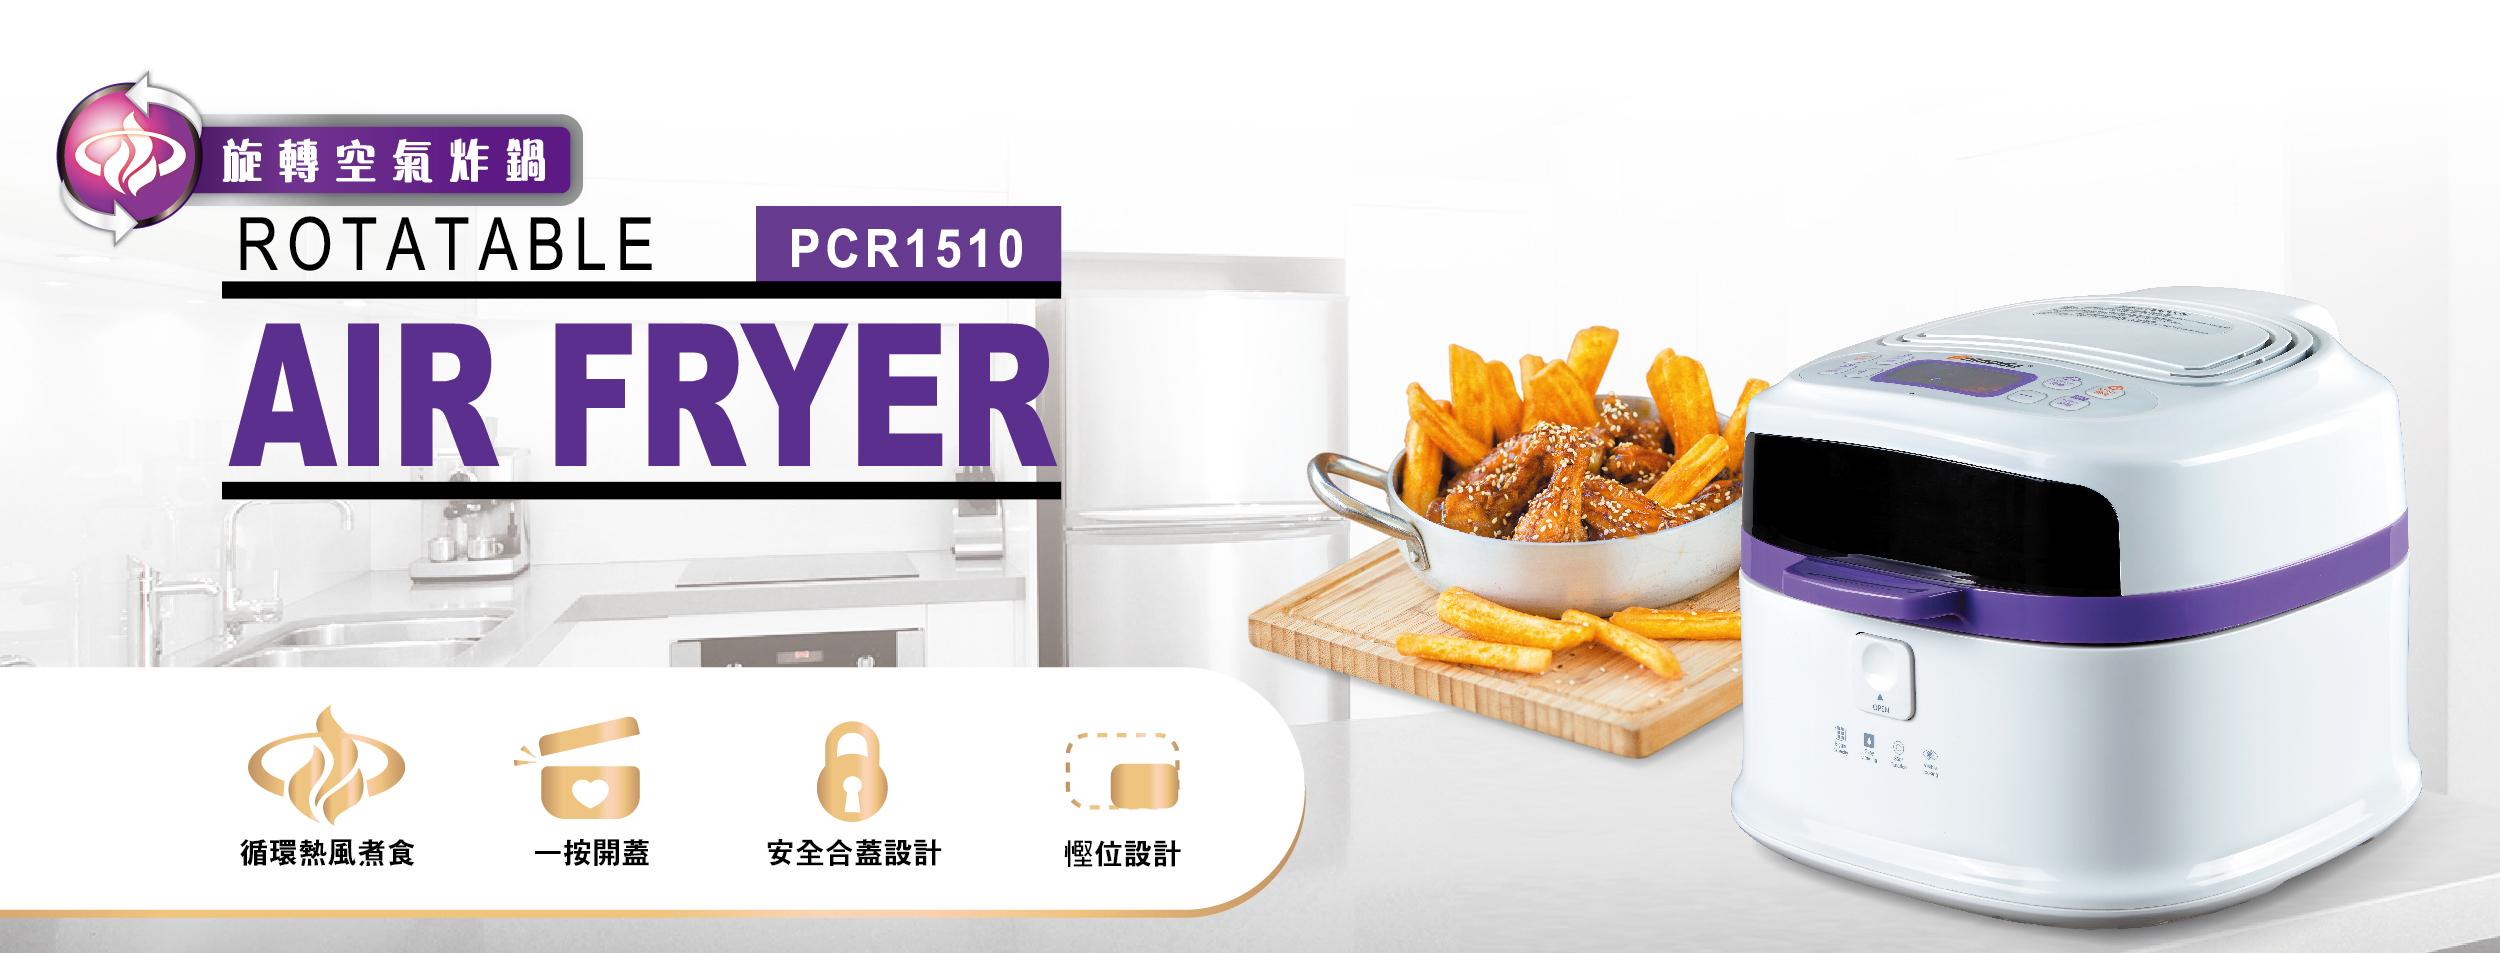 PCR1510-TOP-01